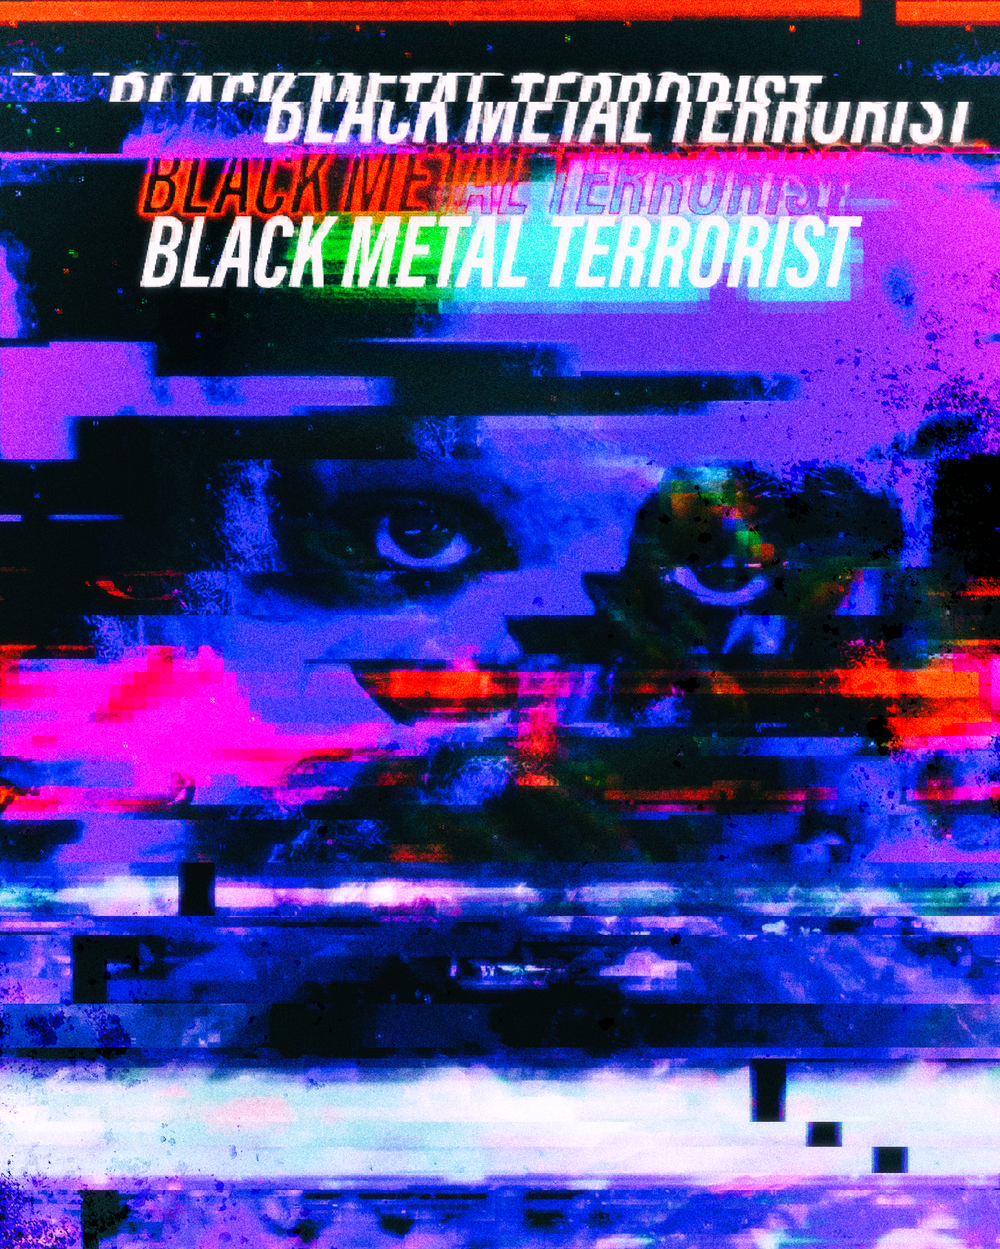 Black Metal Terrorist - 5-09-18